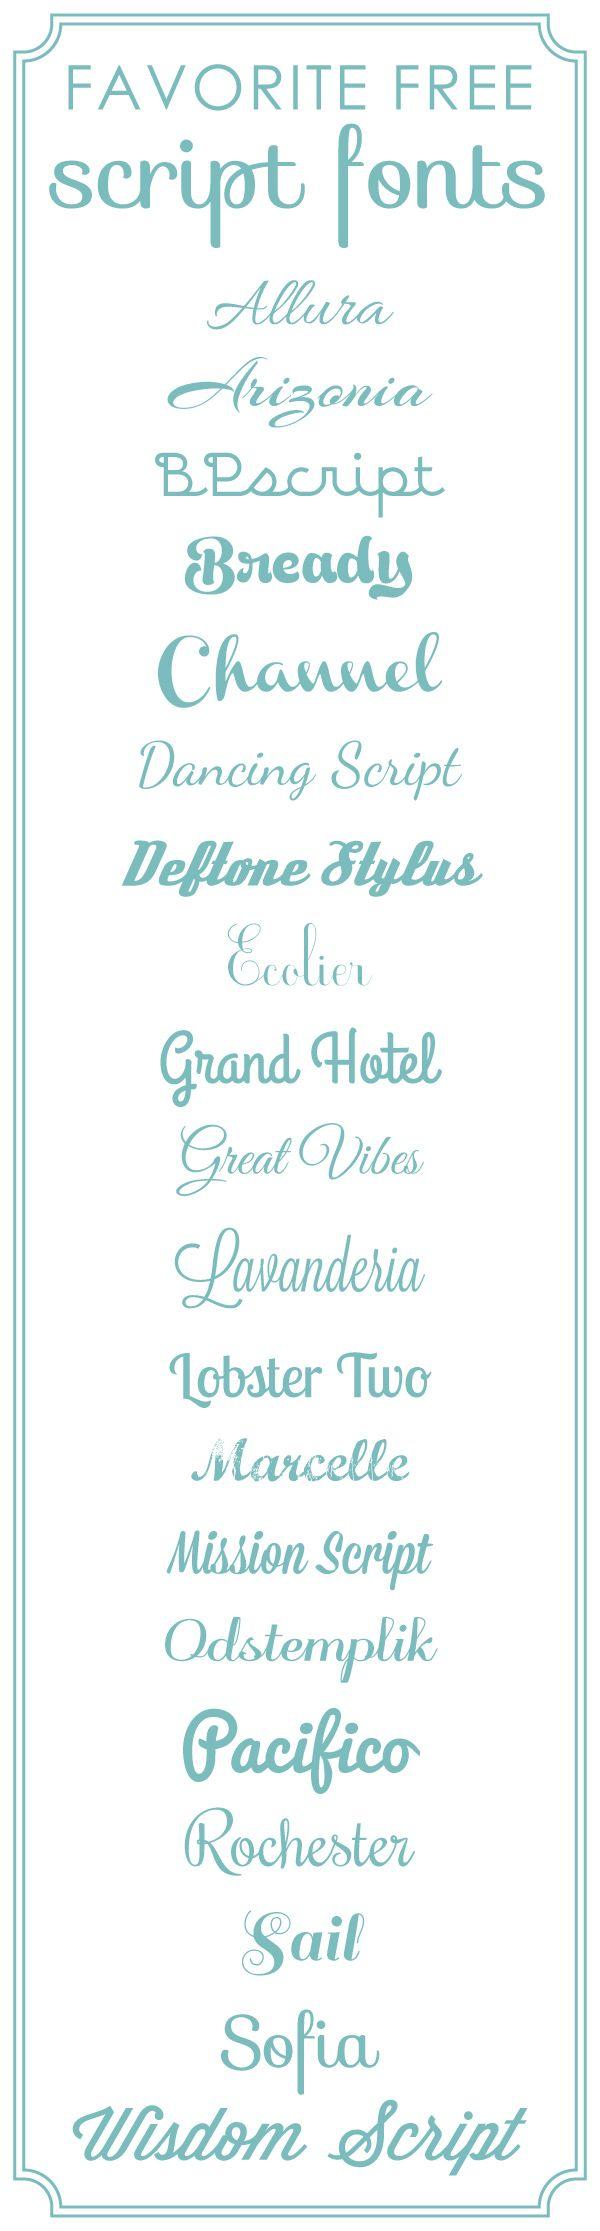 Favorite Free Scrapbook Fonts | Script from @SuzyQ Scraps